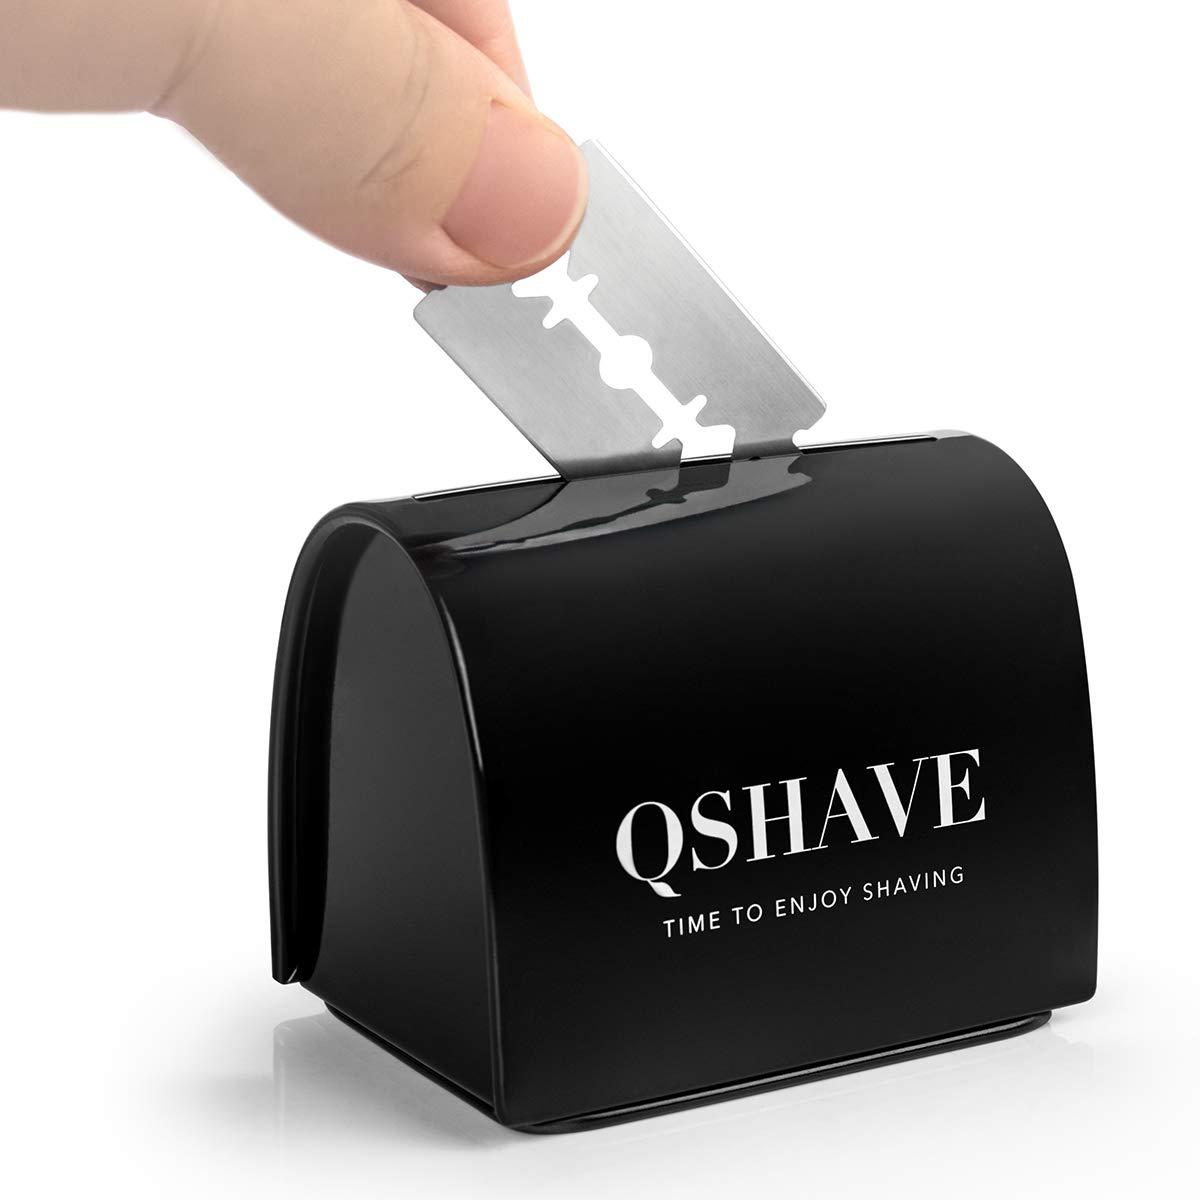 QSHAVE Blade Disposal Case Safe Storage Bank for Used Safety Razor Blades